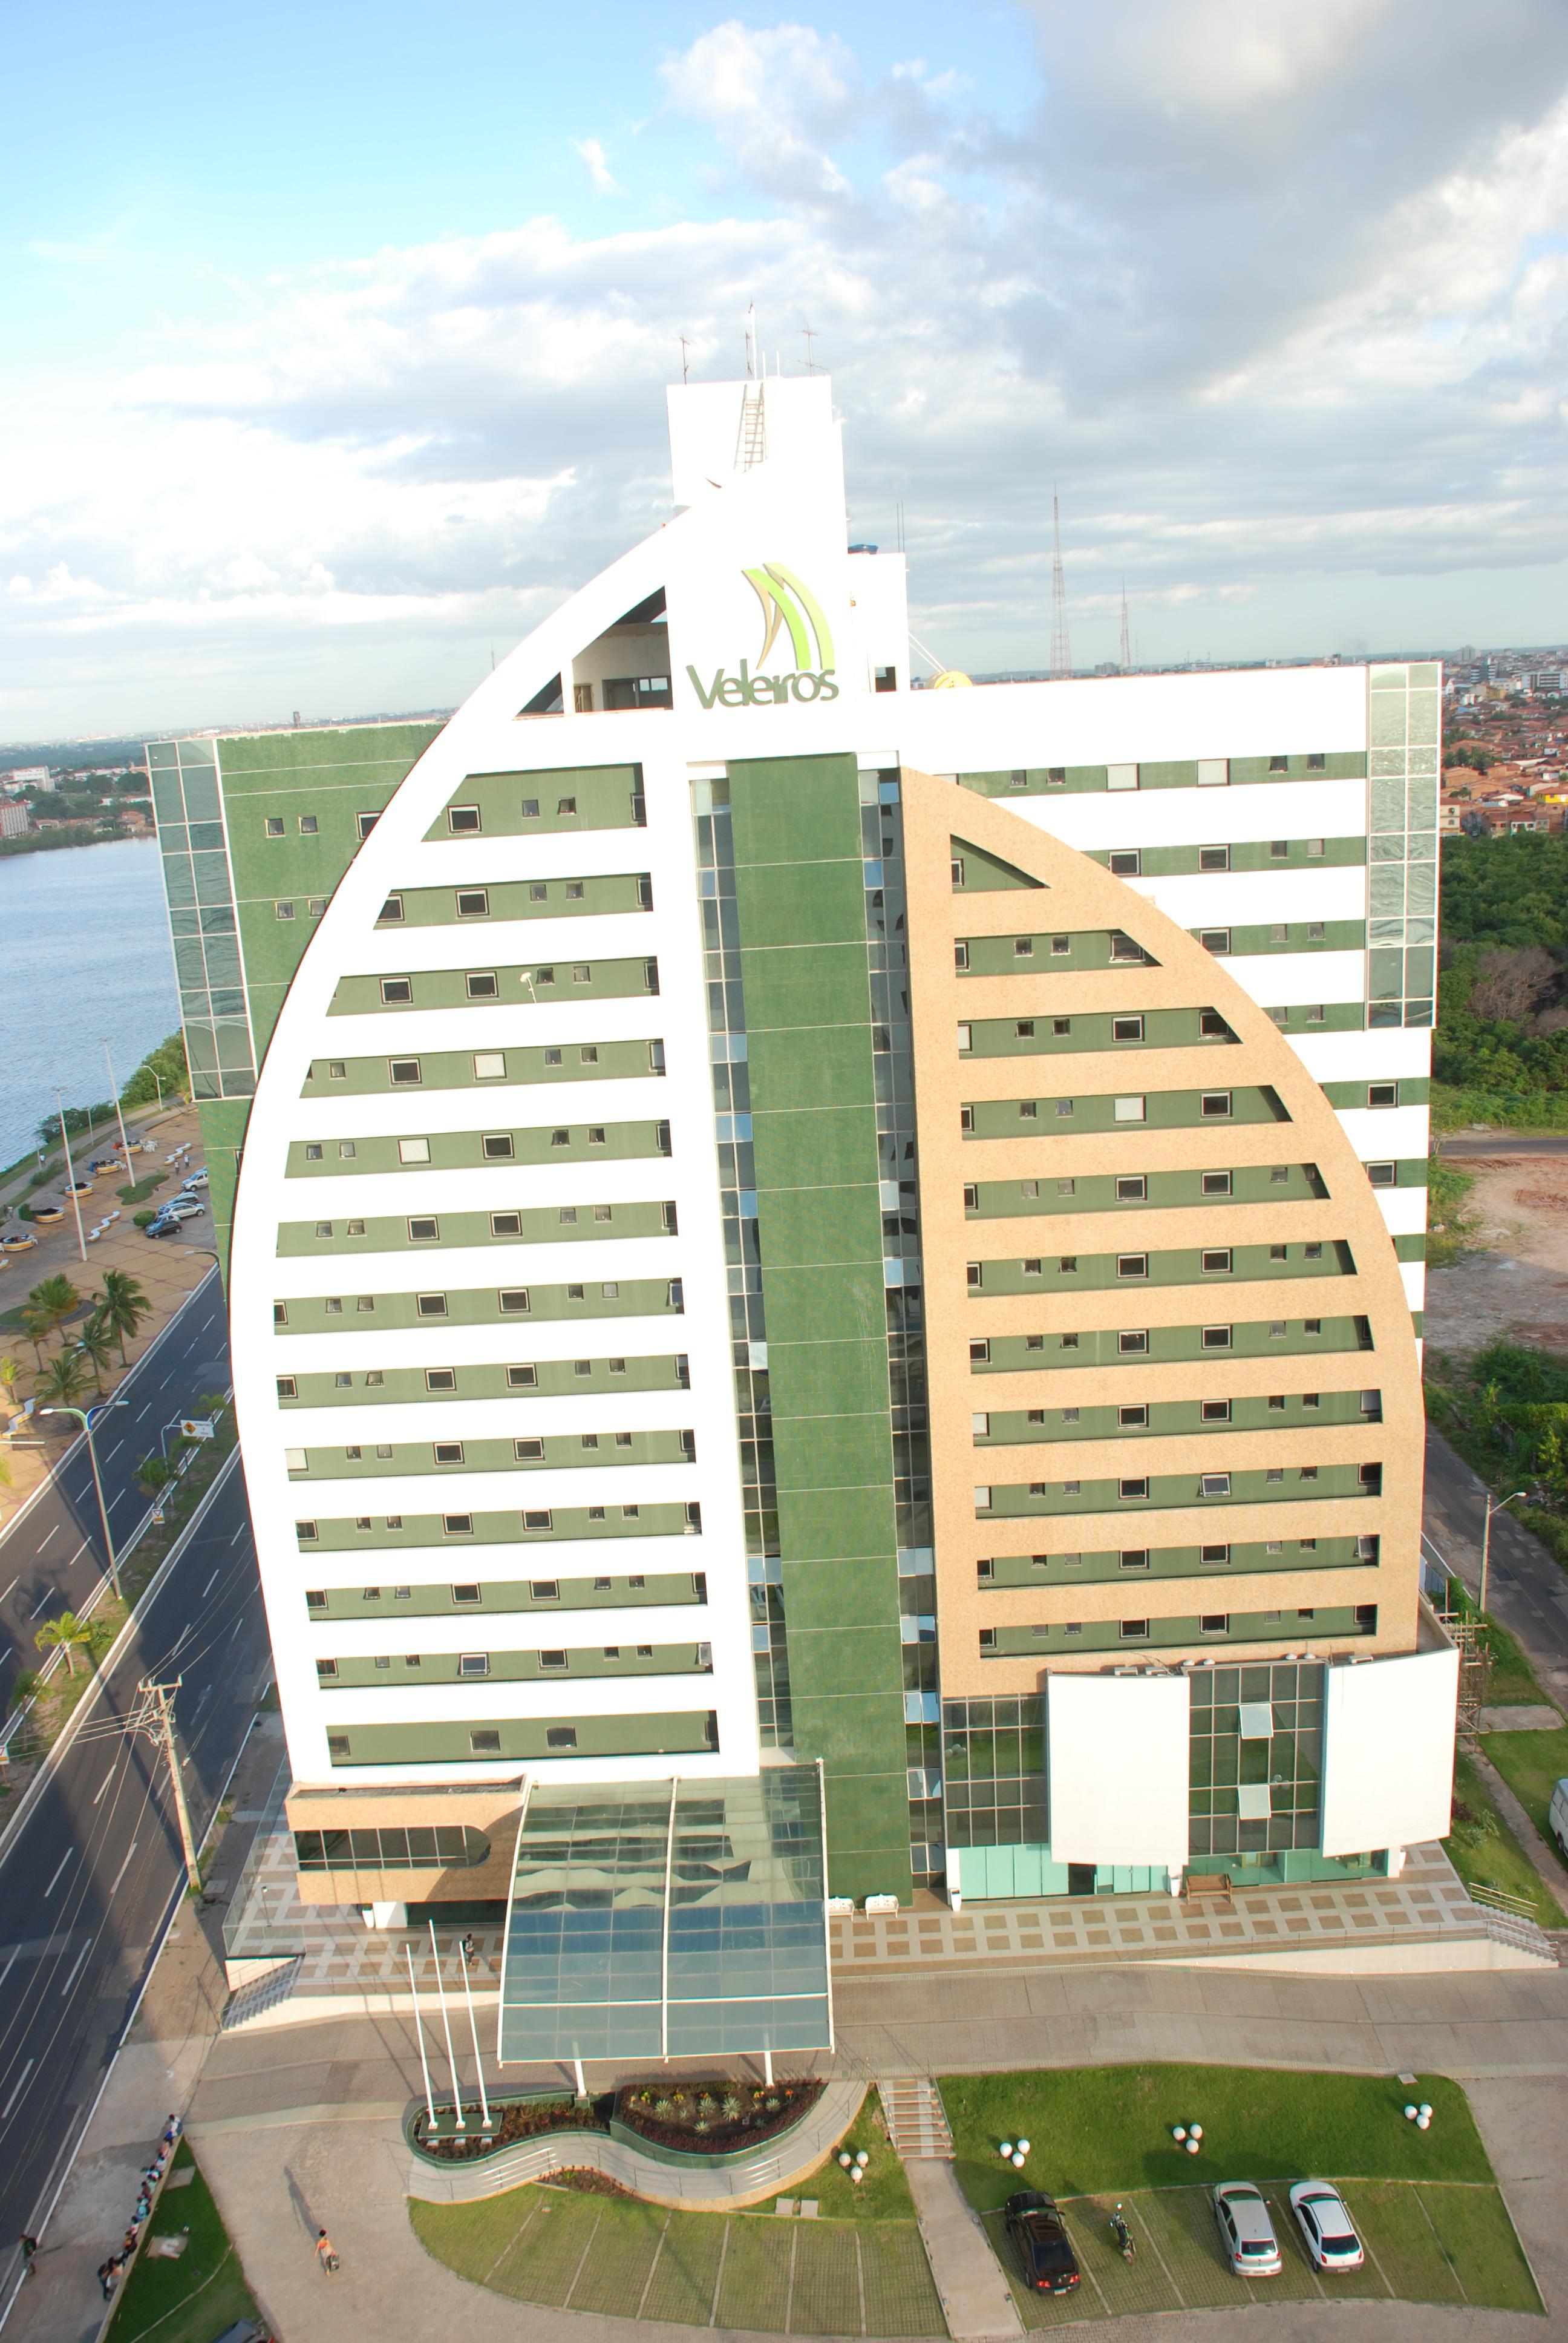 Gallery image of Veleiros Mar Hotel